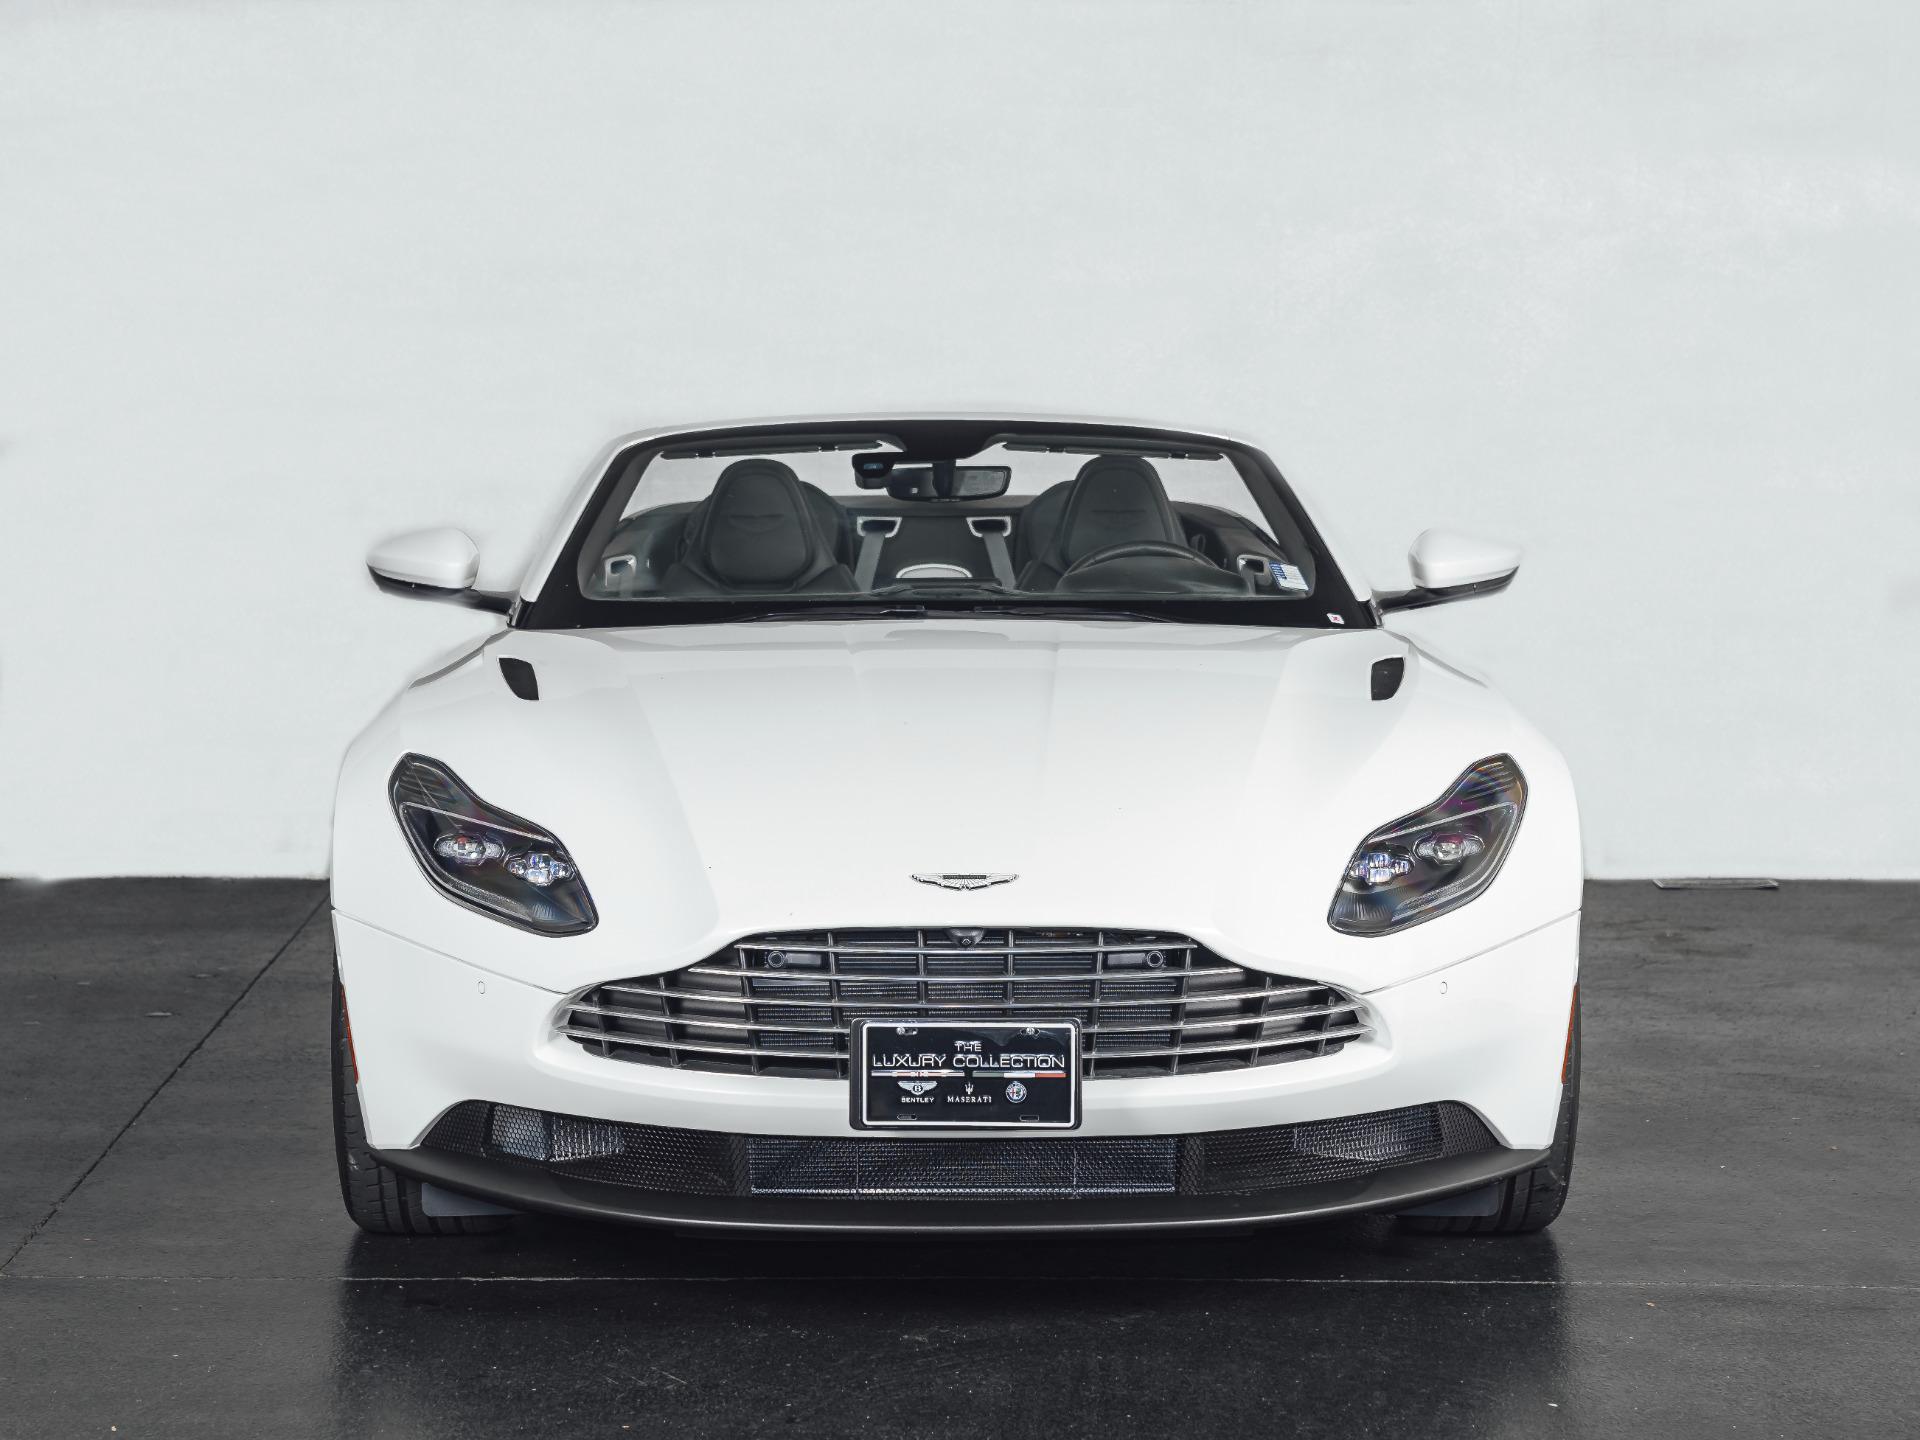 New 2020 Aston Martin Db11 Volante For Sale 243 286 The Luxury Collection Walnut Creek Stock Aml023